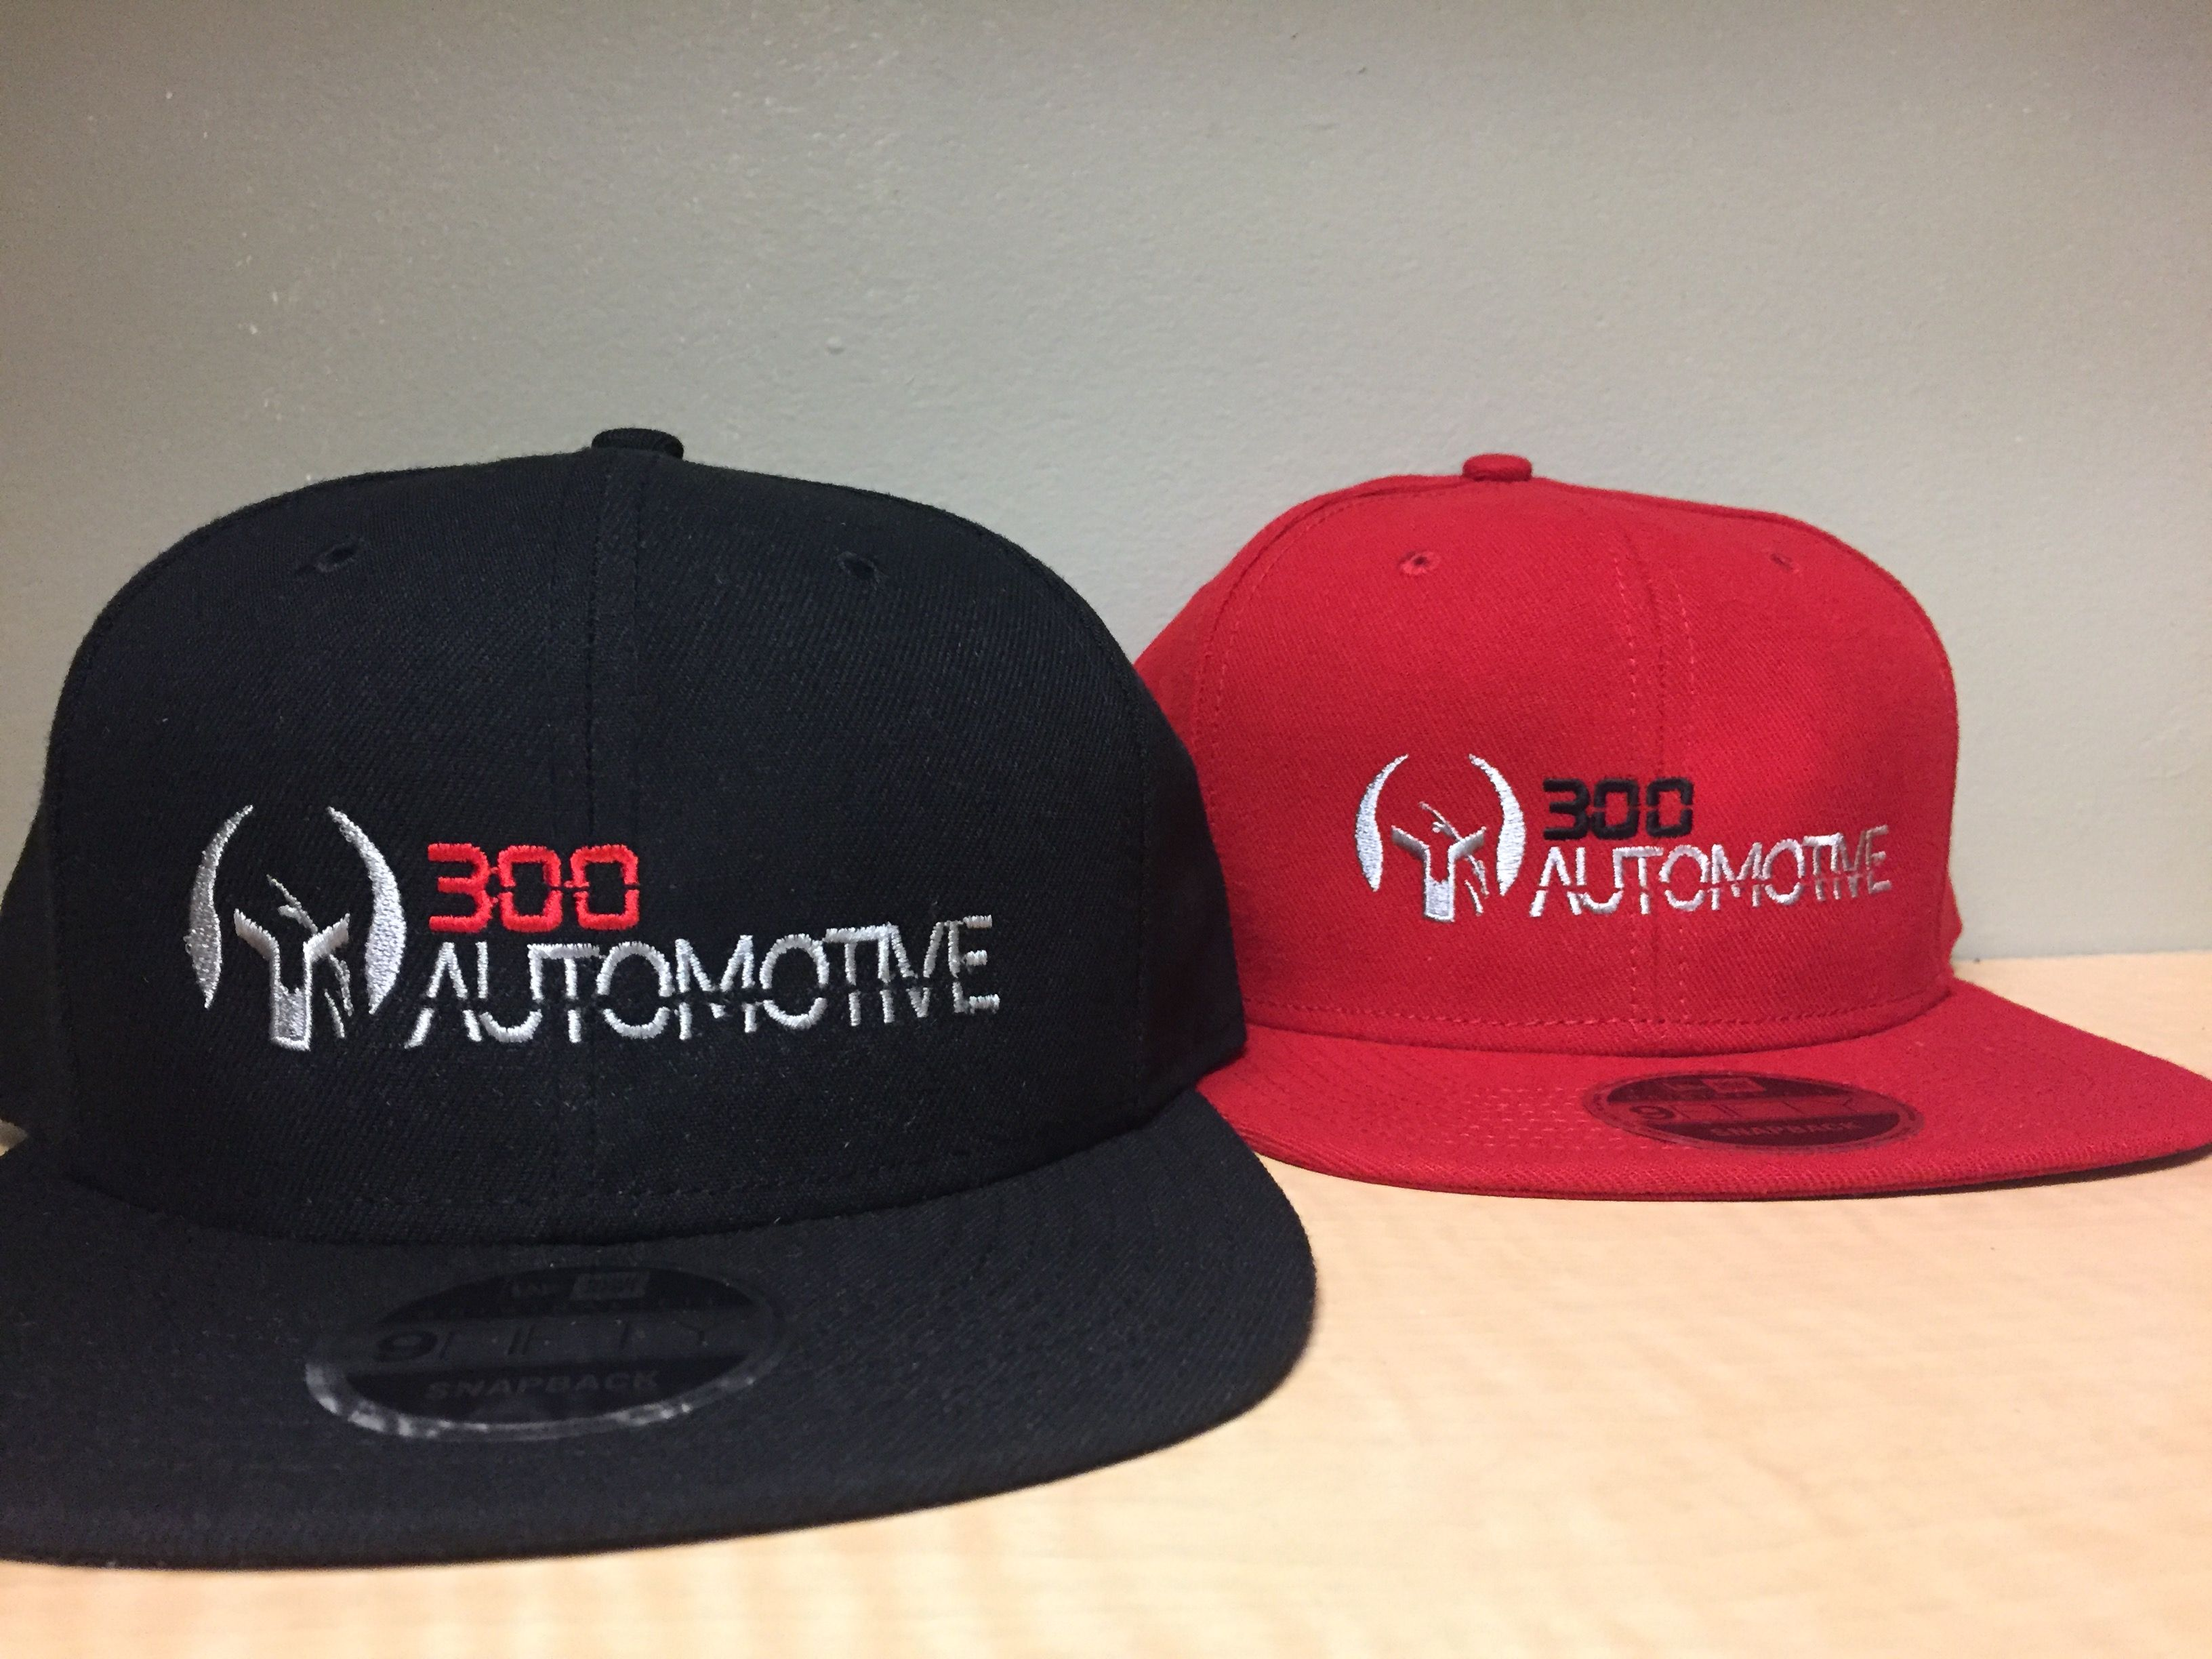 300 Automotive